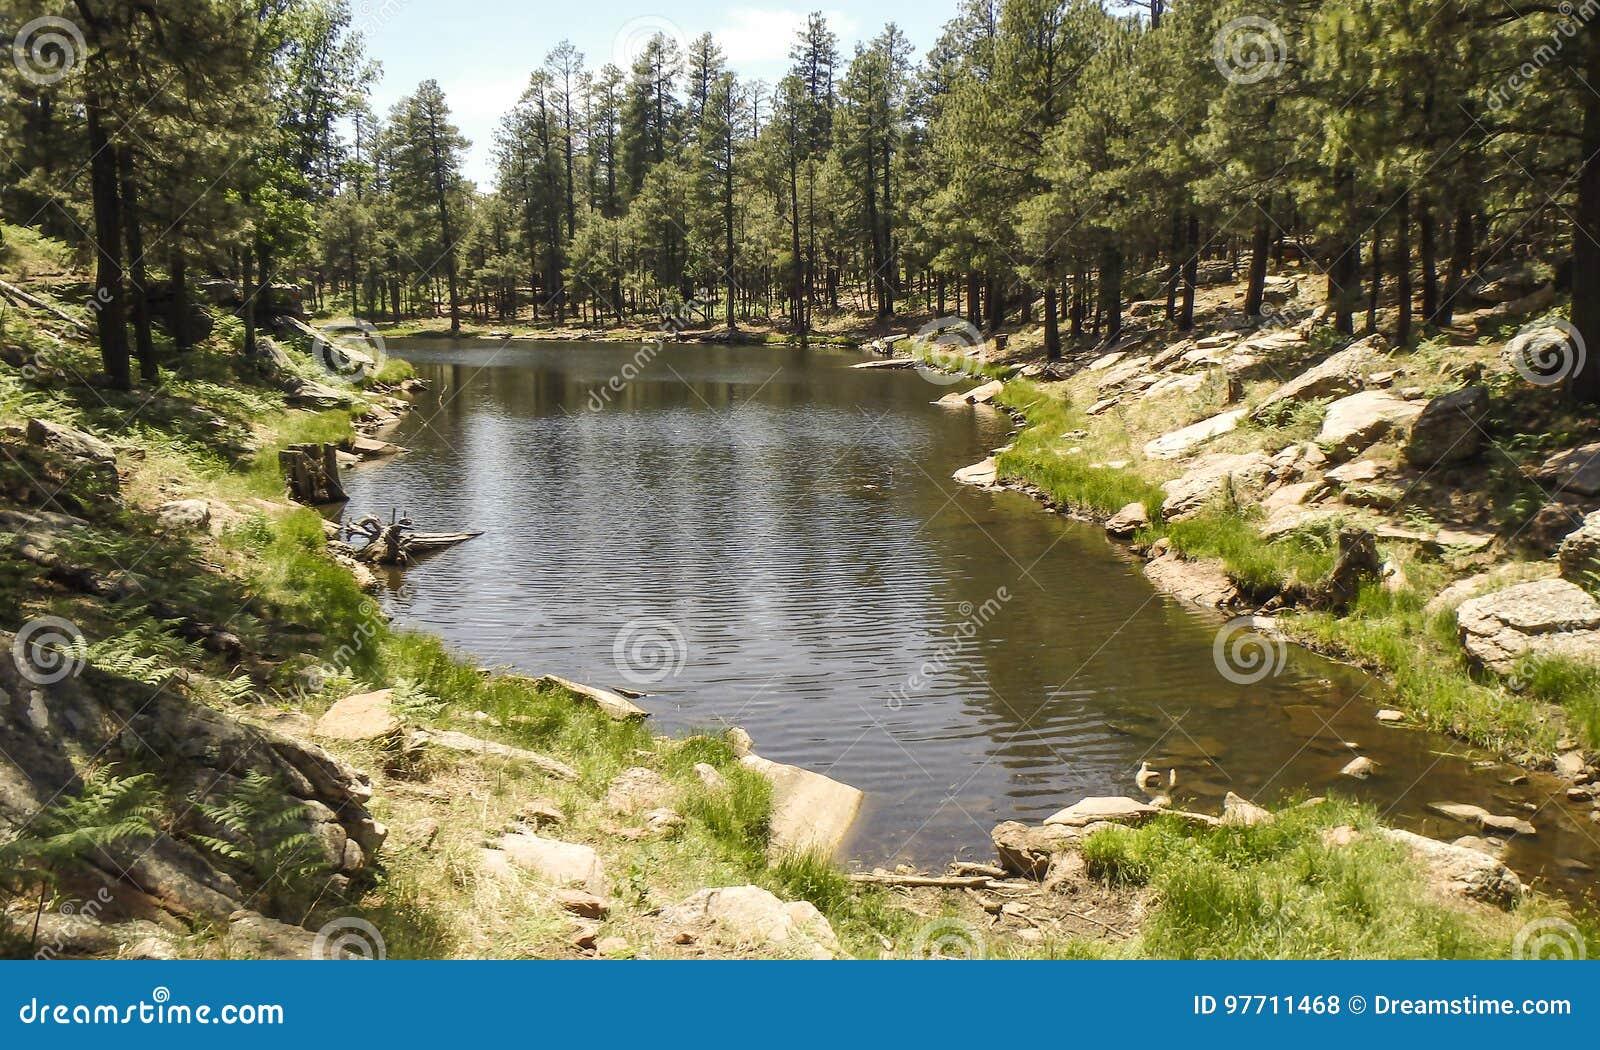 Woods canyon lake arizona stock photo image of scenery 97711468 download comp publicscrutiny Image collections